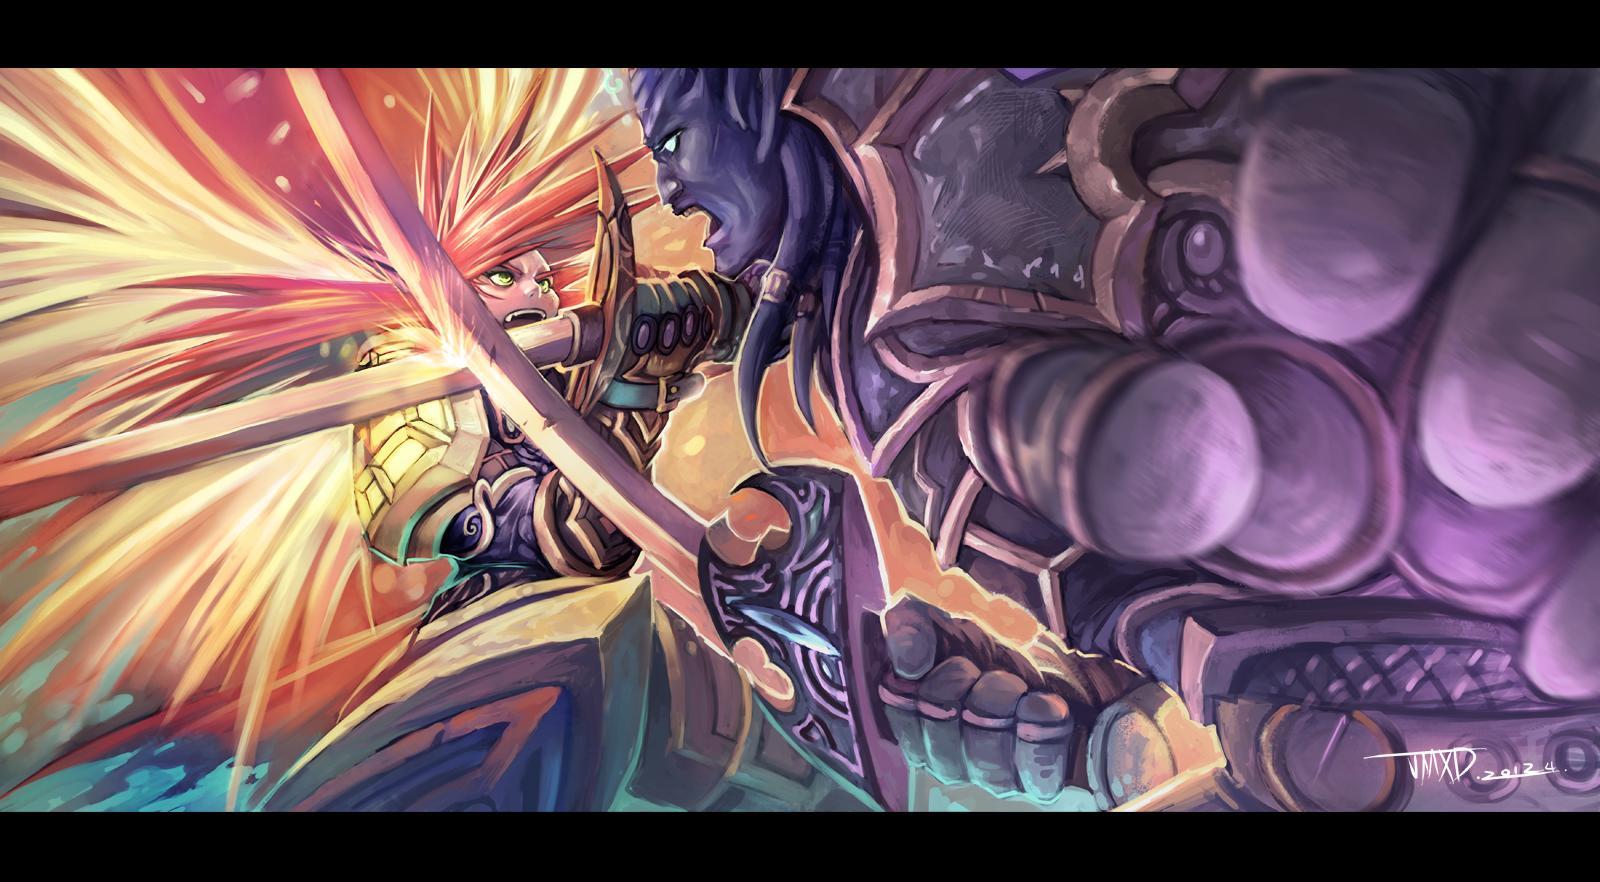 Duel by JMXD